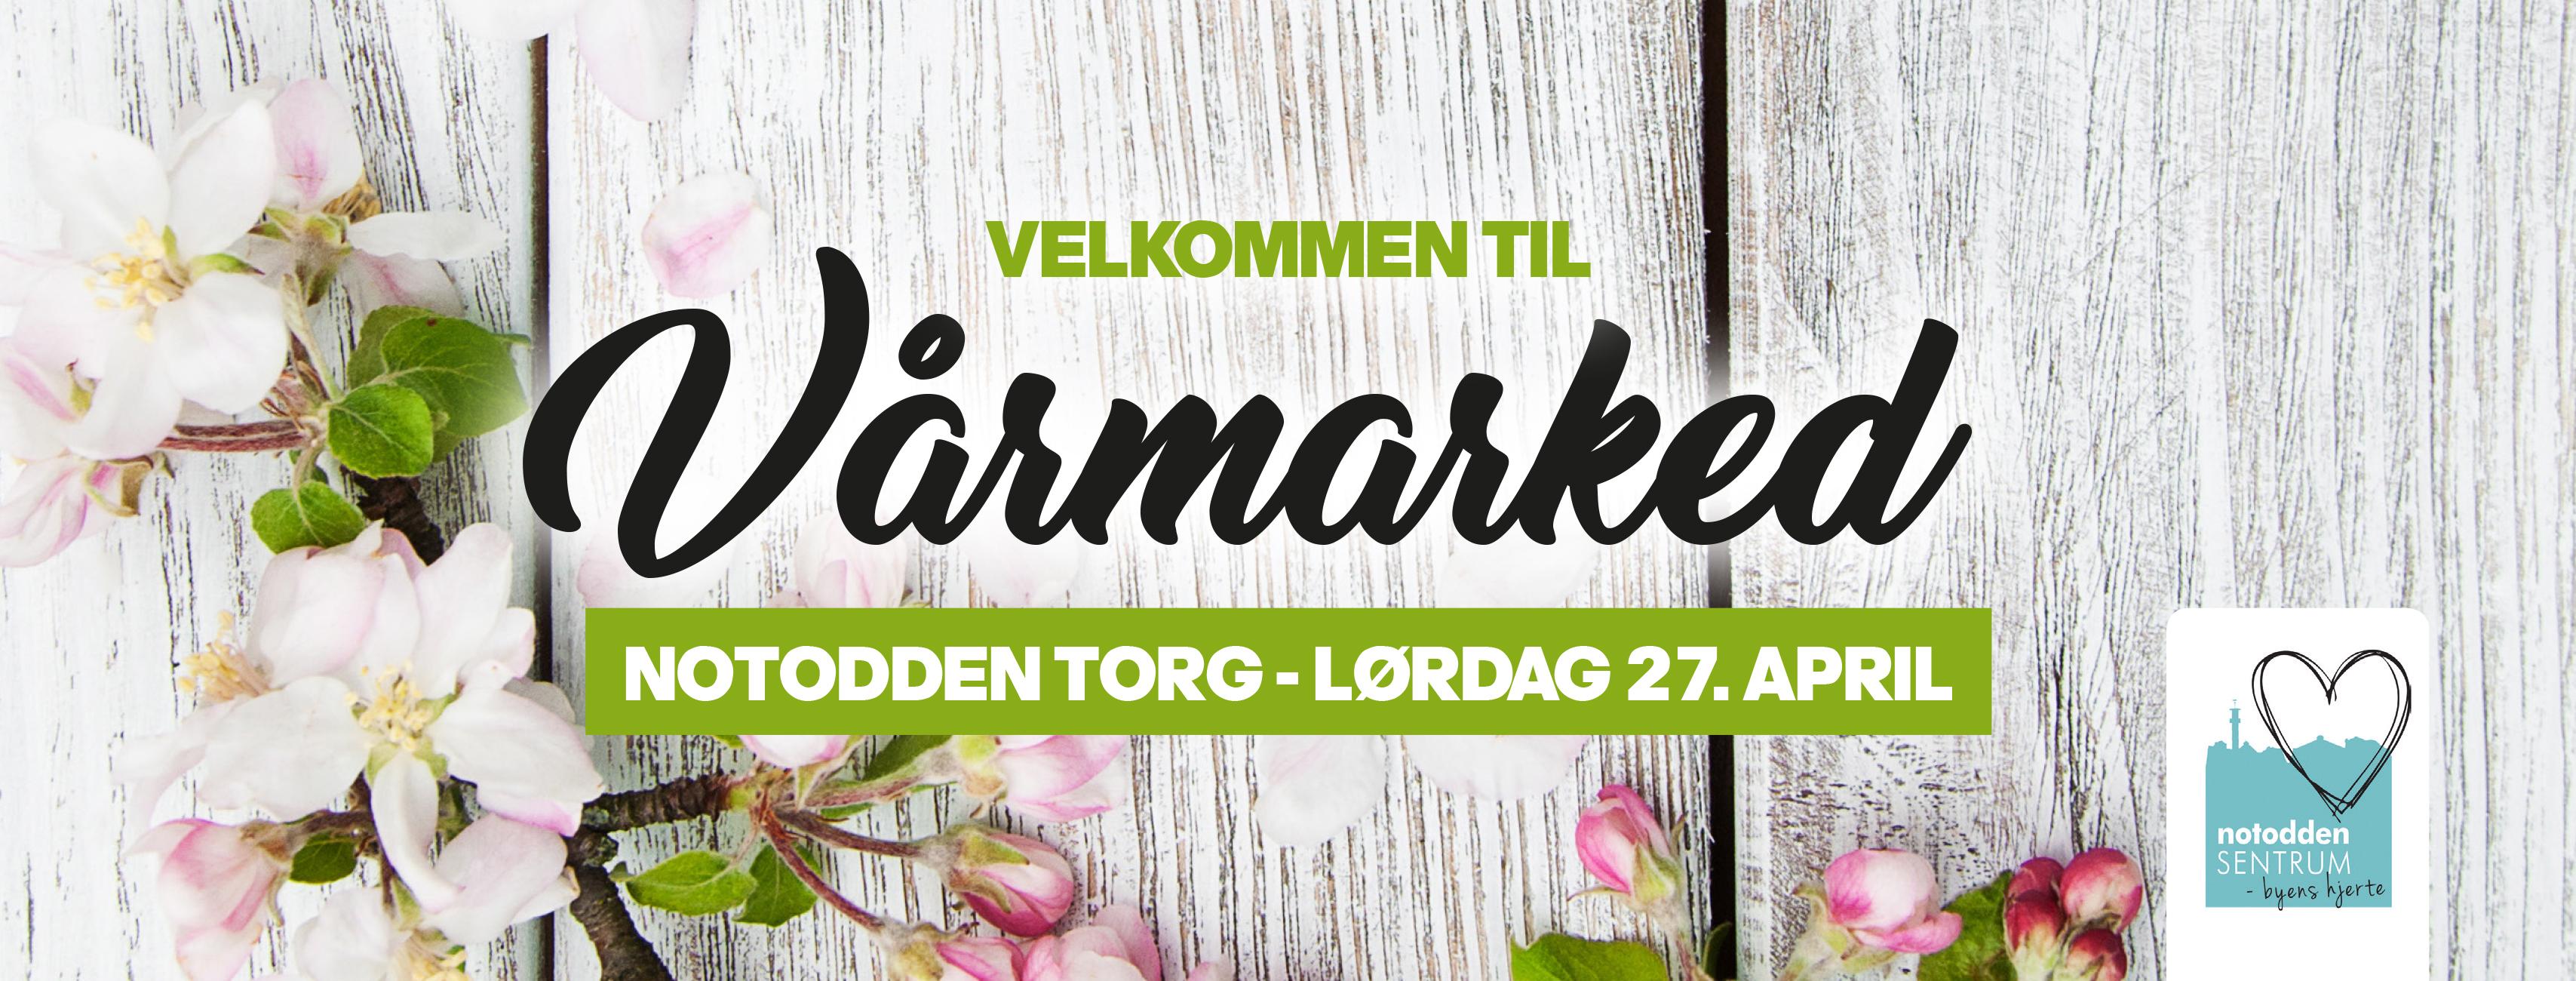 Varmarked 27 April 2019 Notodddenby